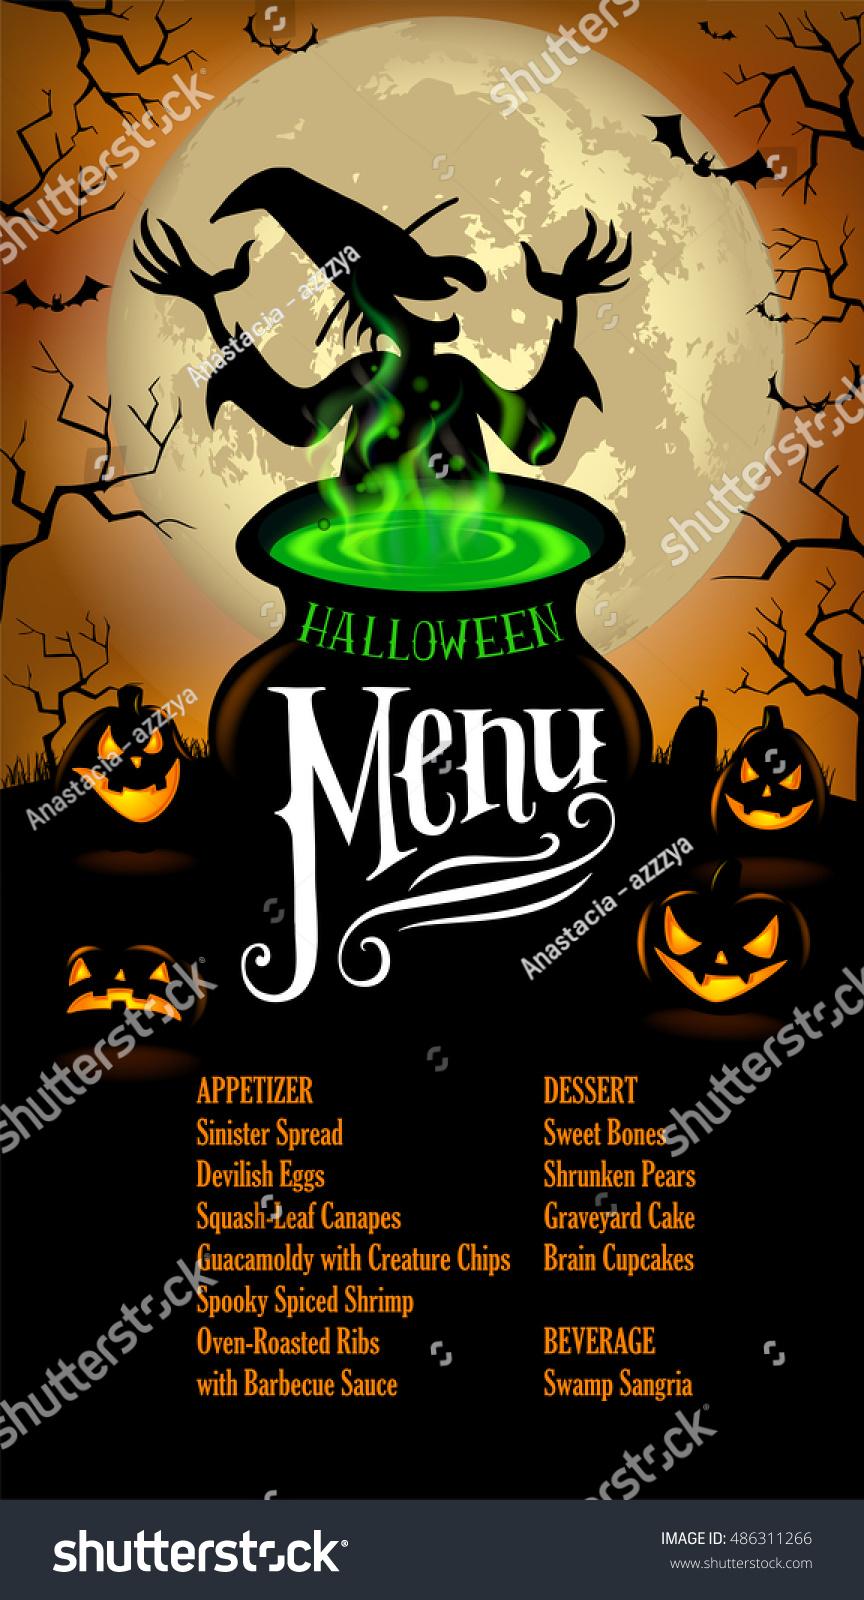 Halloween Menu Template Stock Vector 486311266 - Shutterstock